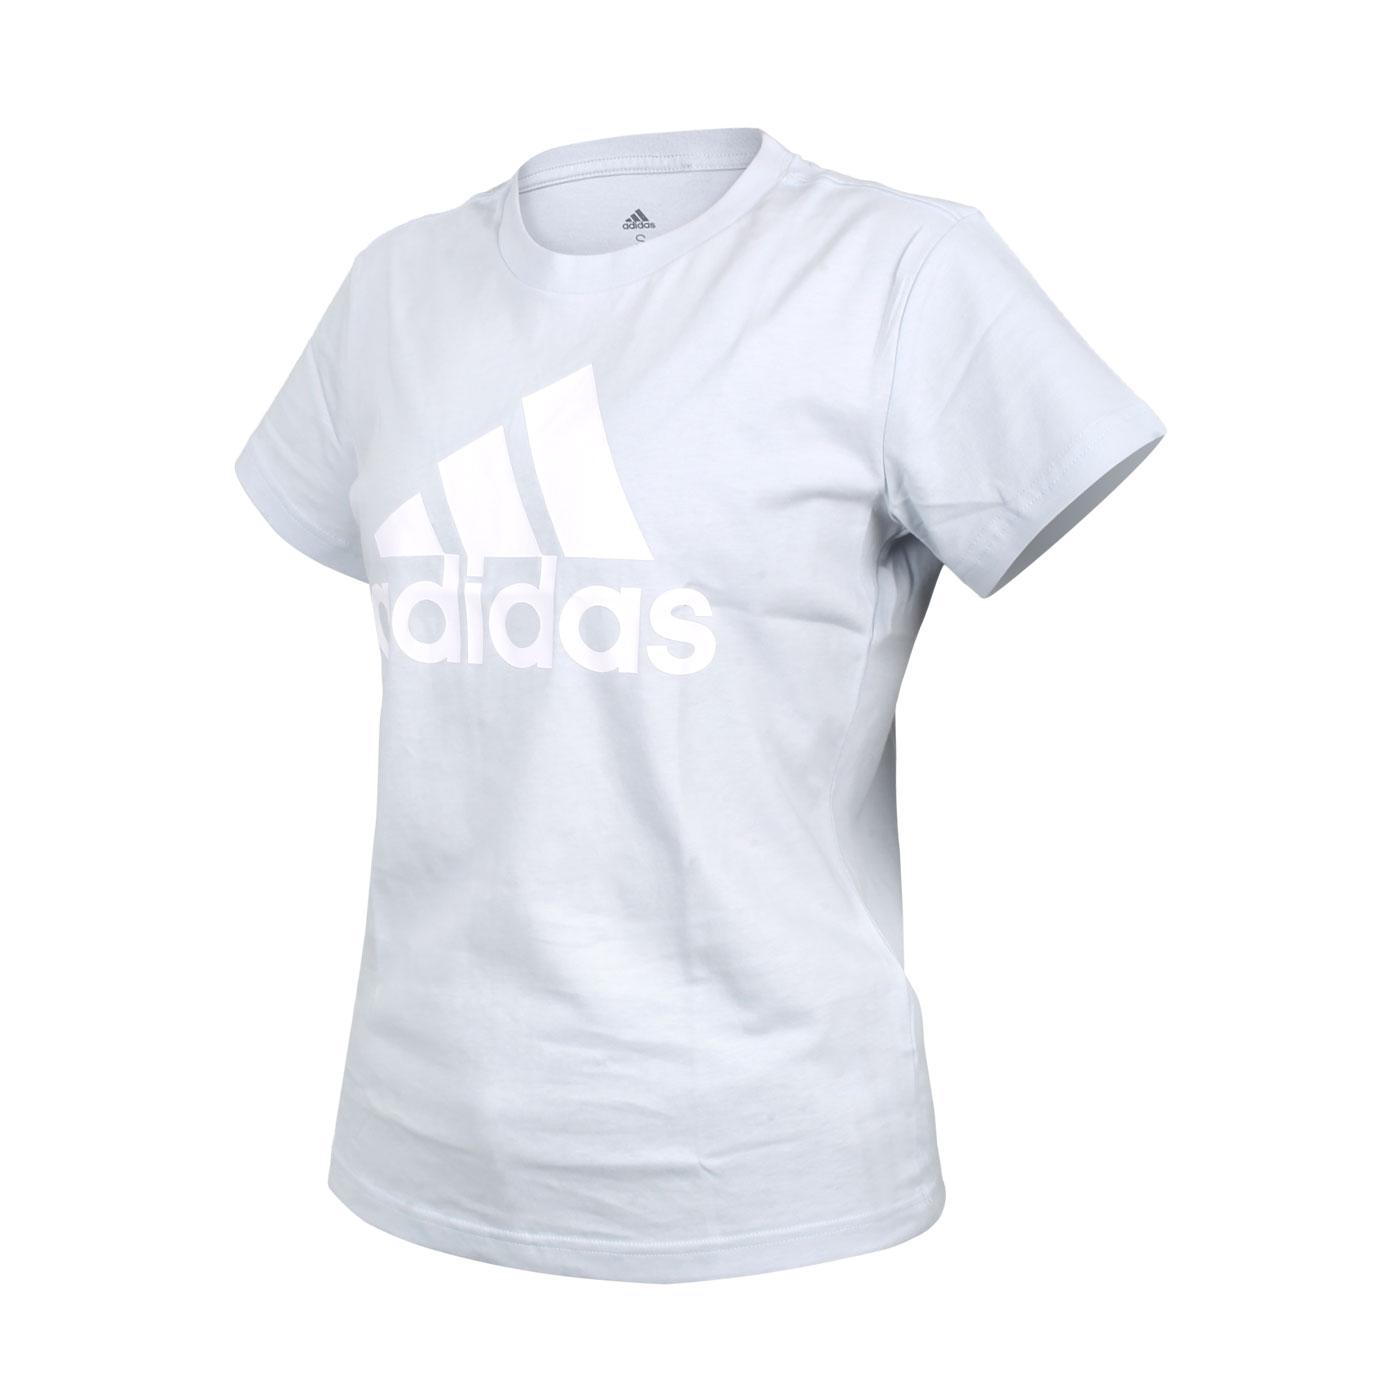 ADIDAS 女款短袖T恤 GV4029